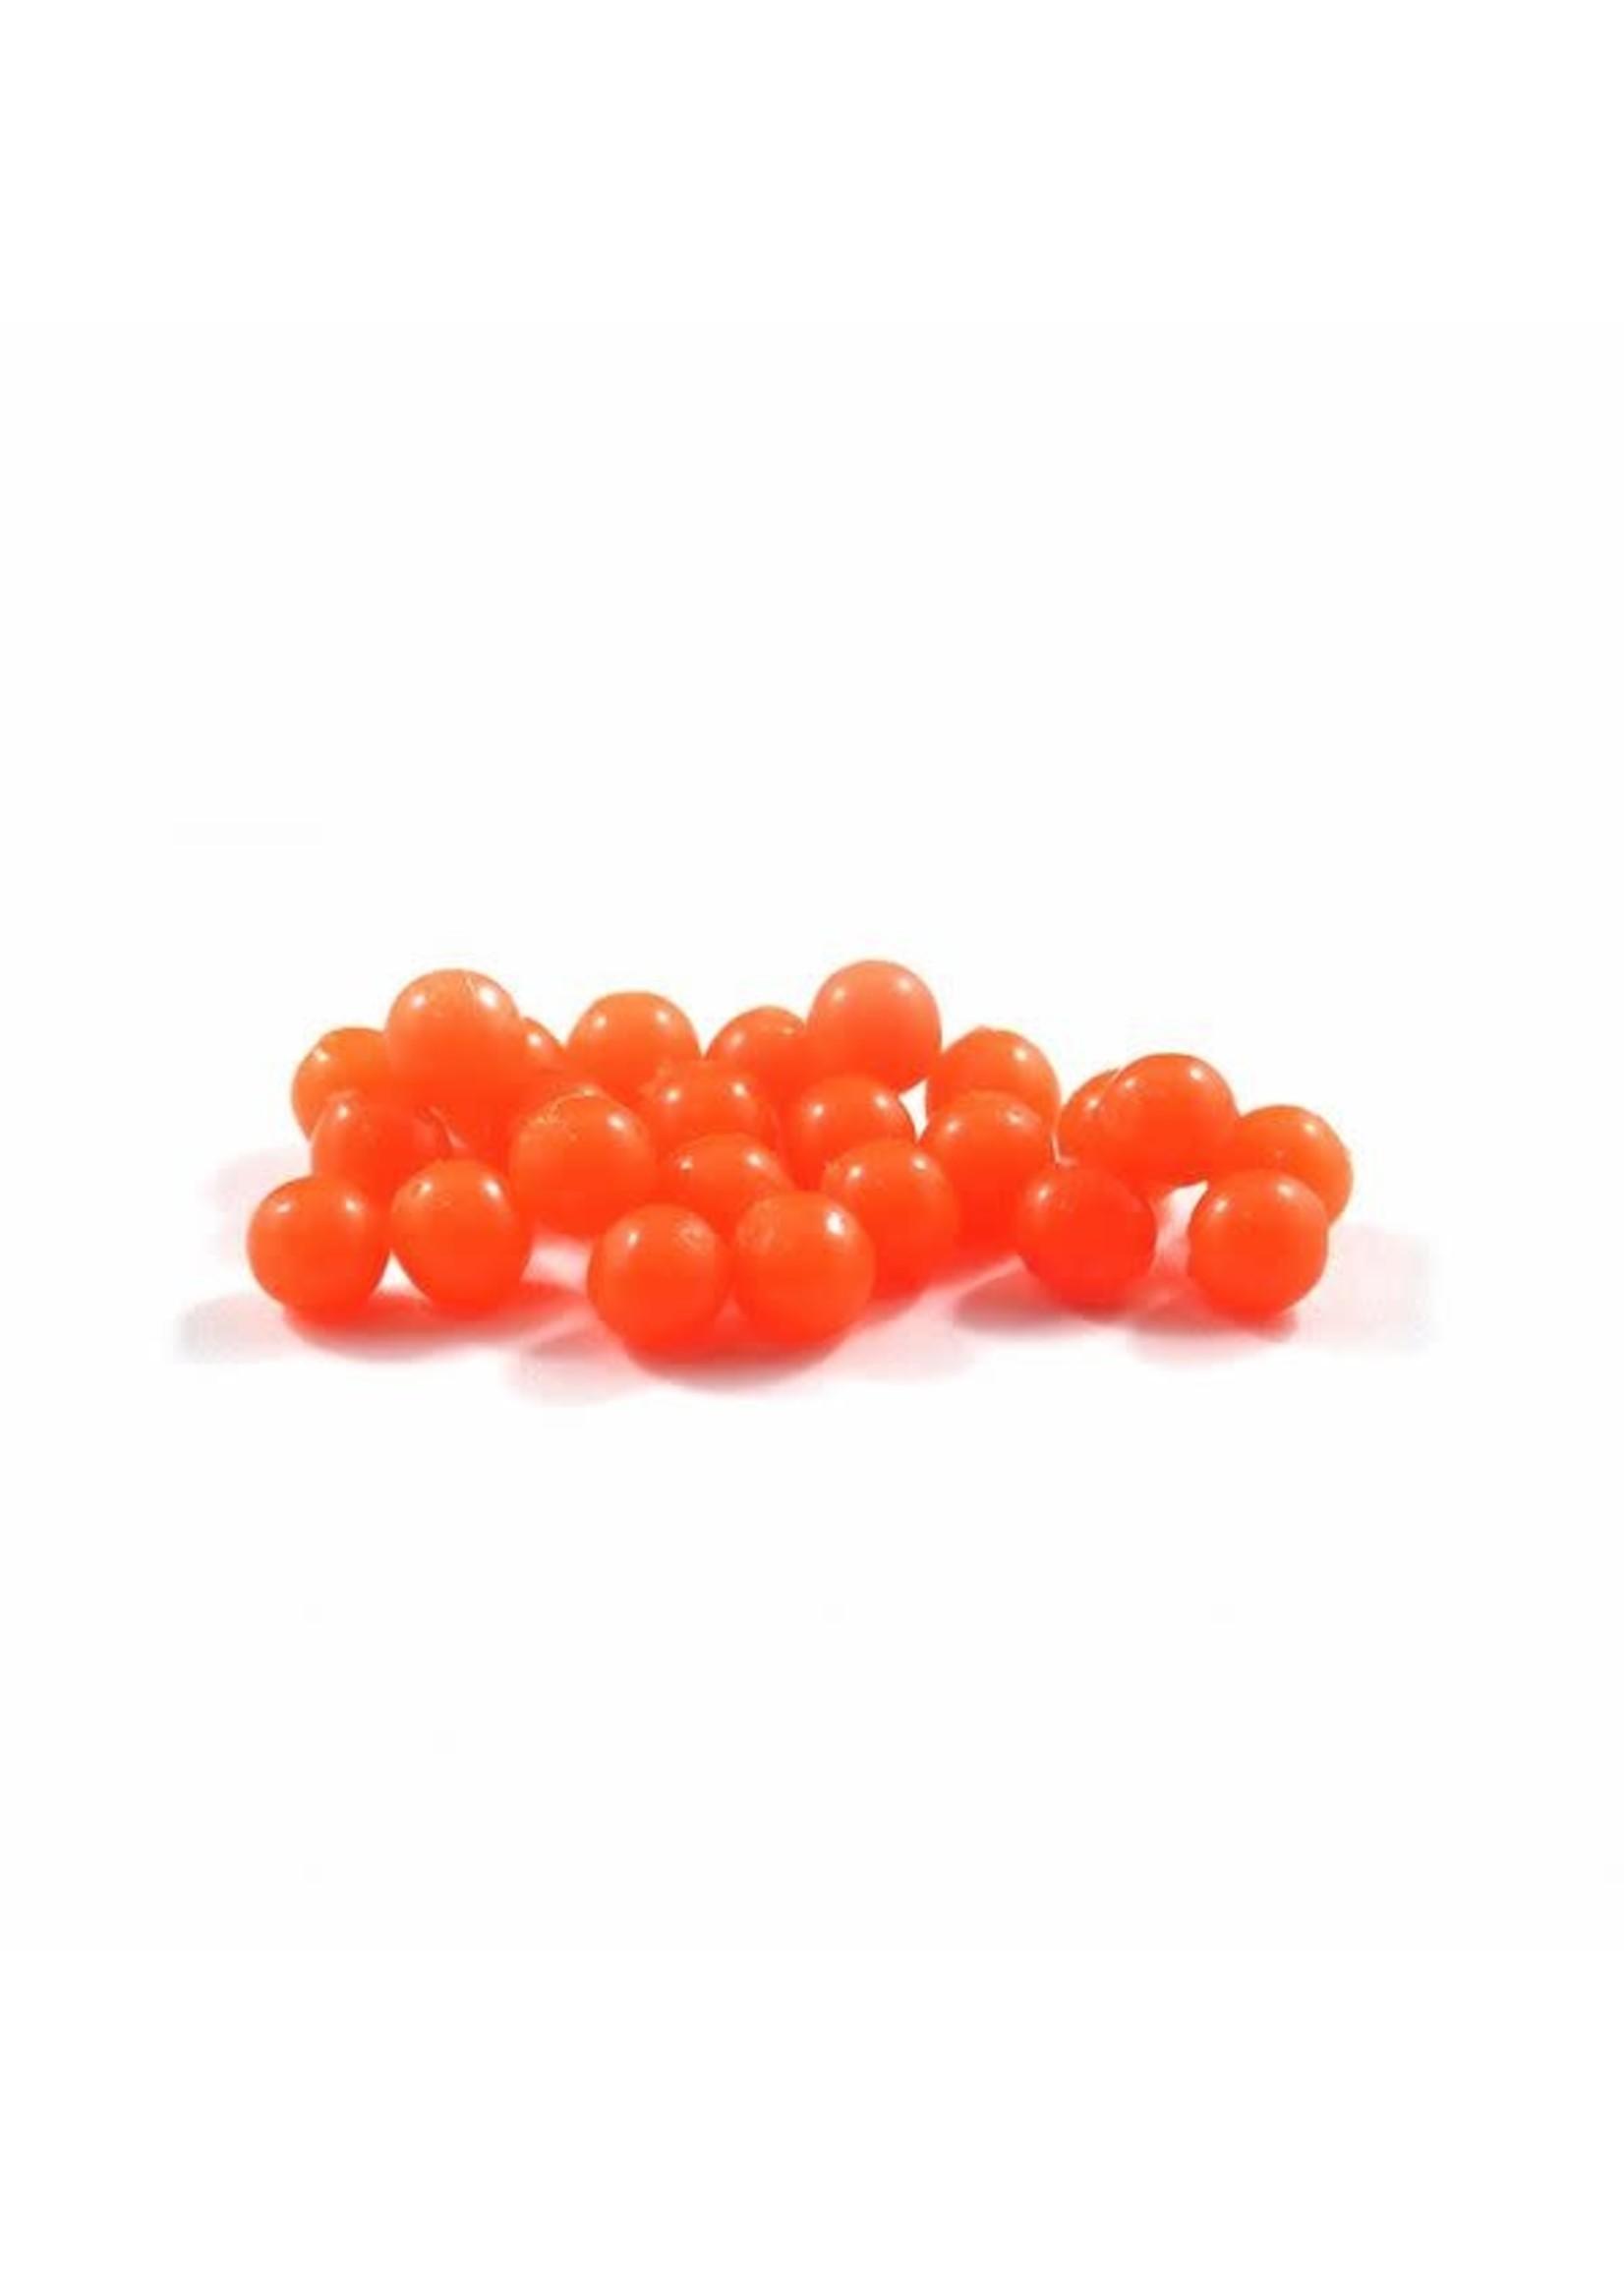 Cleardrift Cleardrift Glow Embryo Soft Beads Peach Glow 14mm